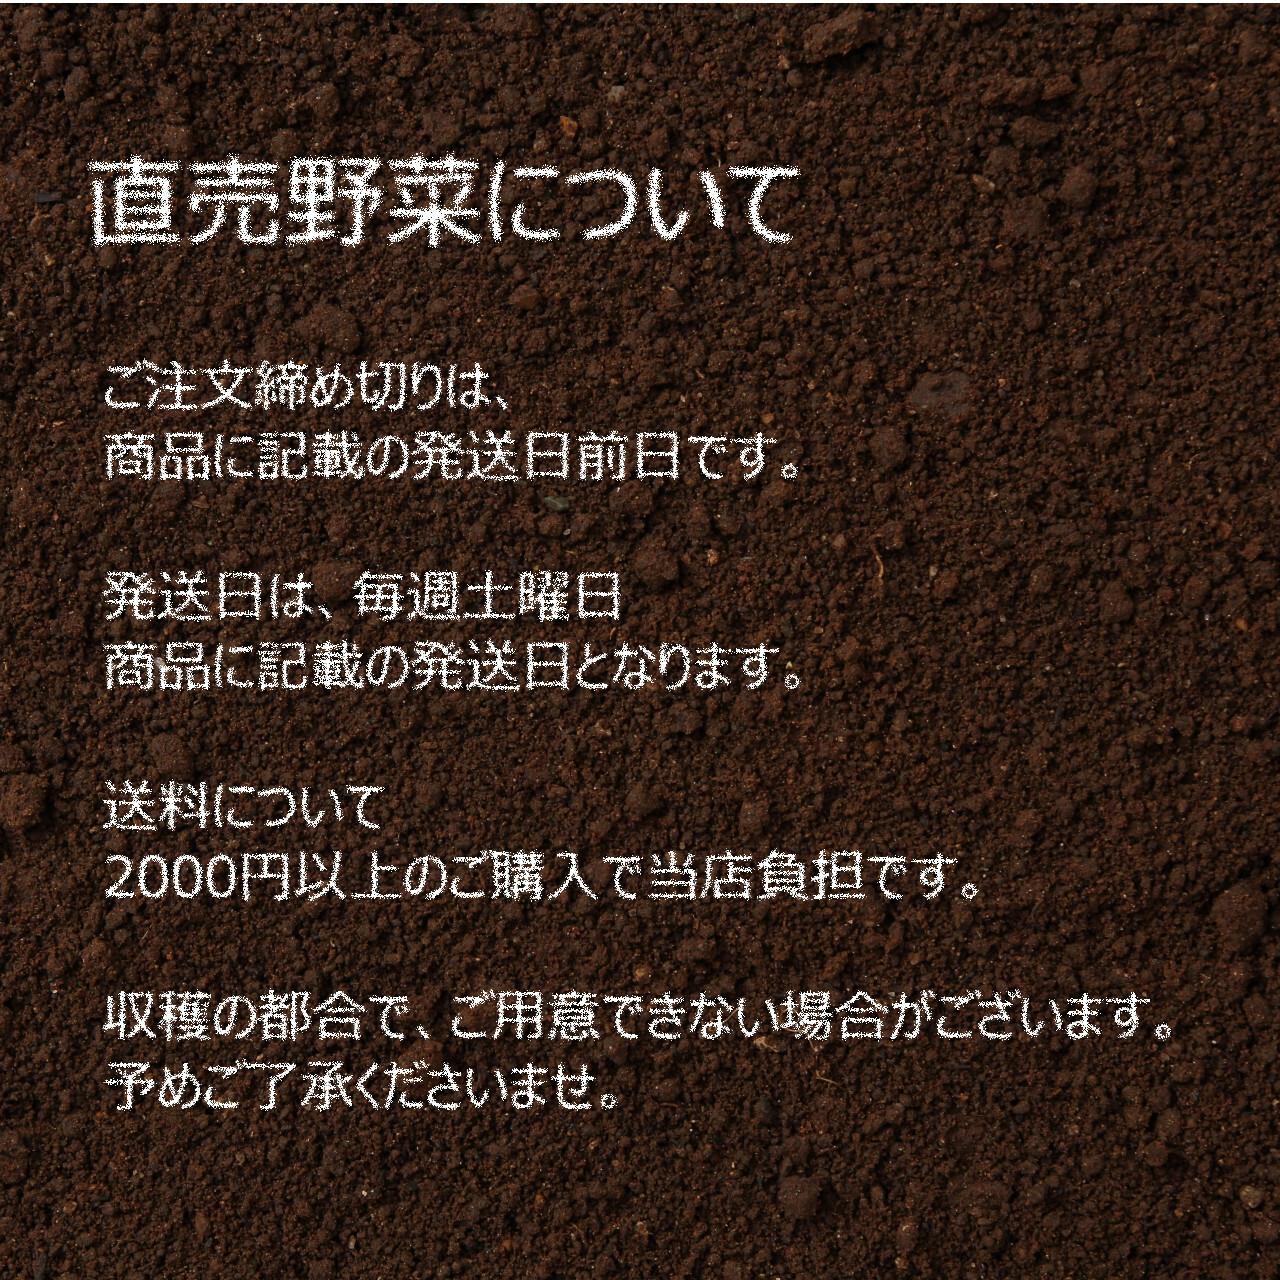 大根 約 1~2本 : 6月の朝採り直売野菜 春の新鮮野菜 6月20日発送予定